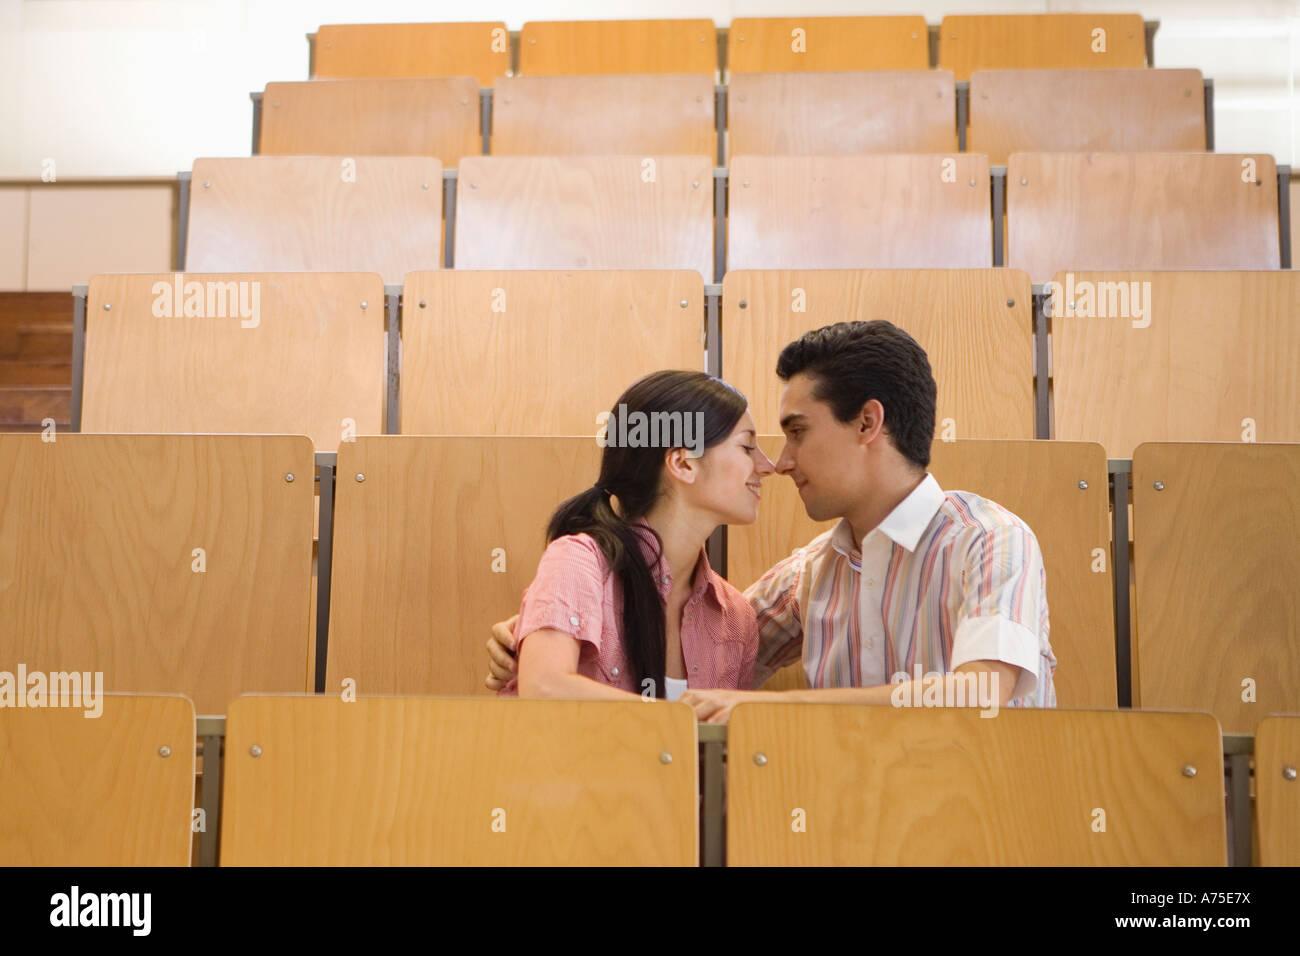 Studenten, die in leeren Klassenzimmer küssen Stockbild